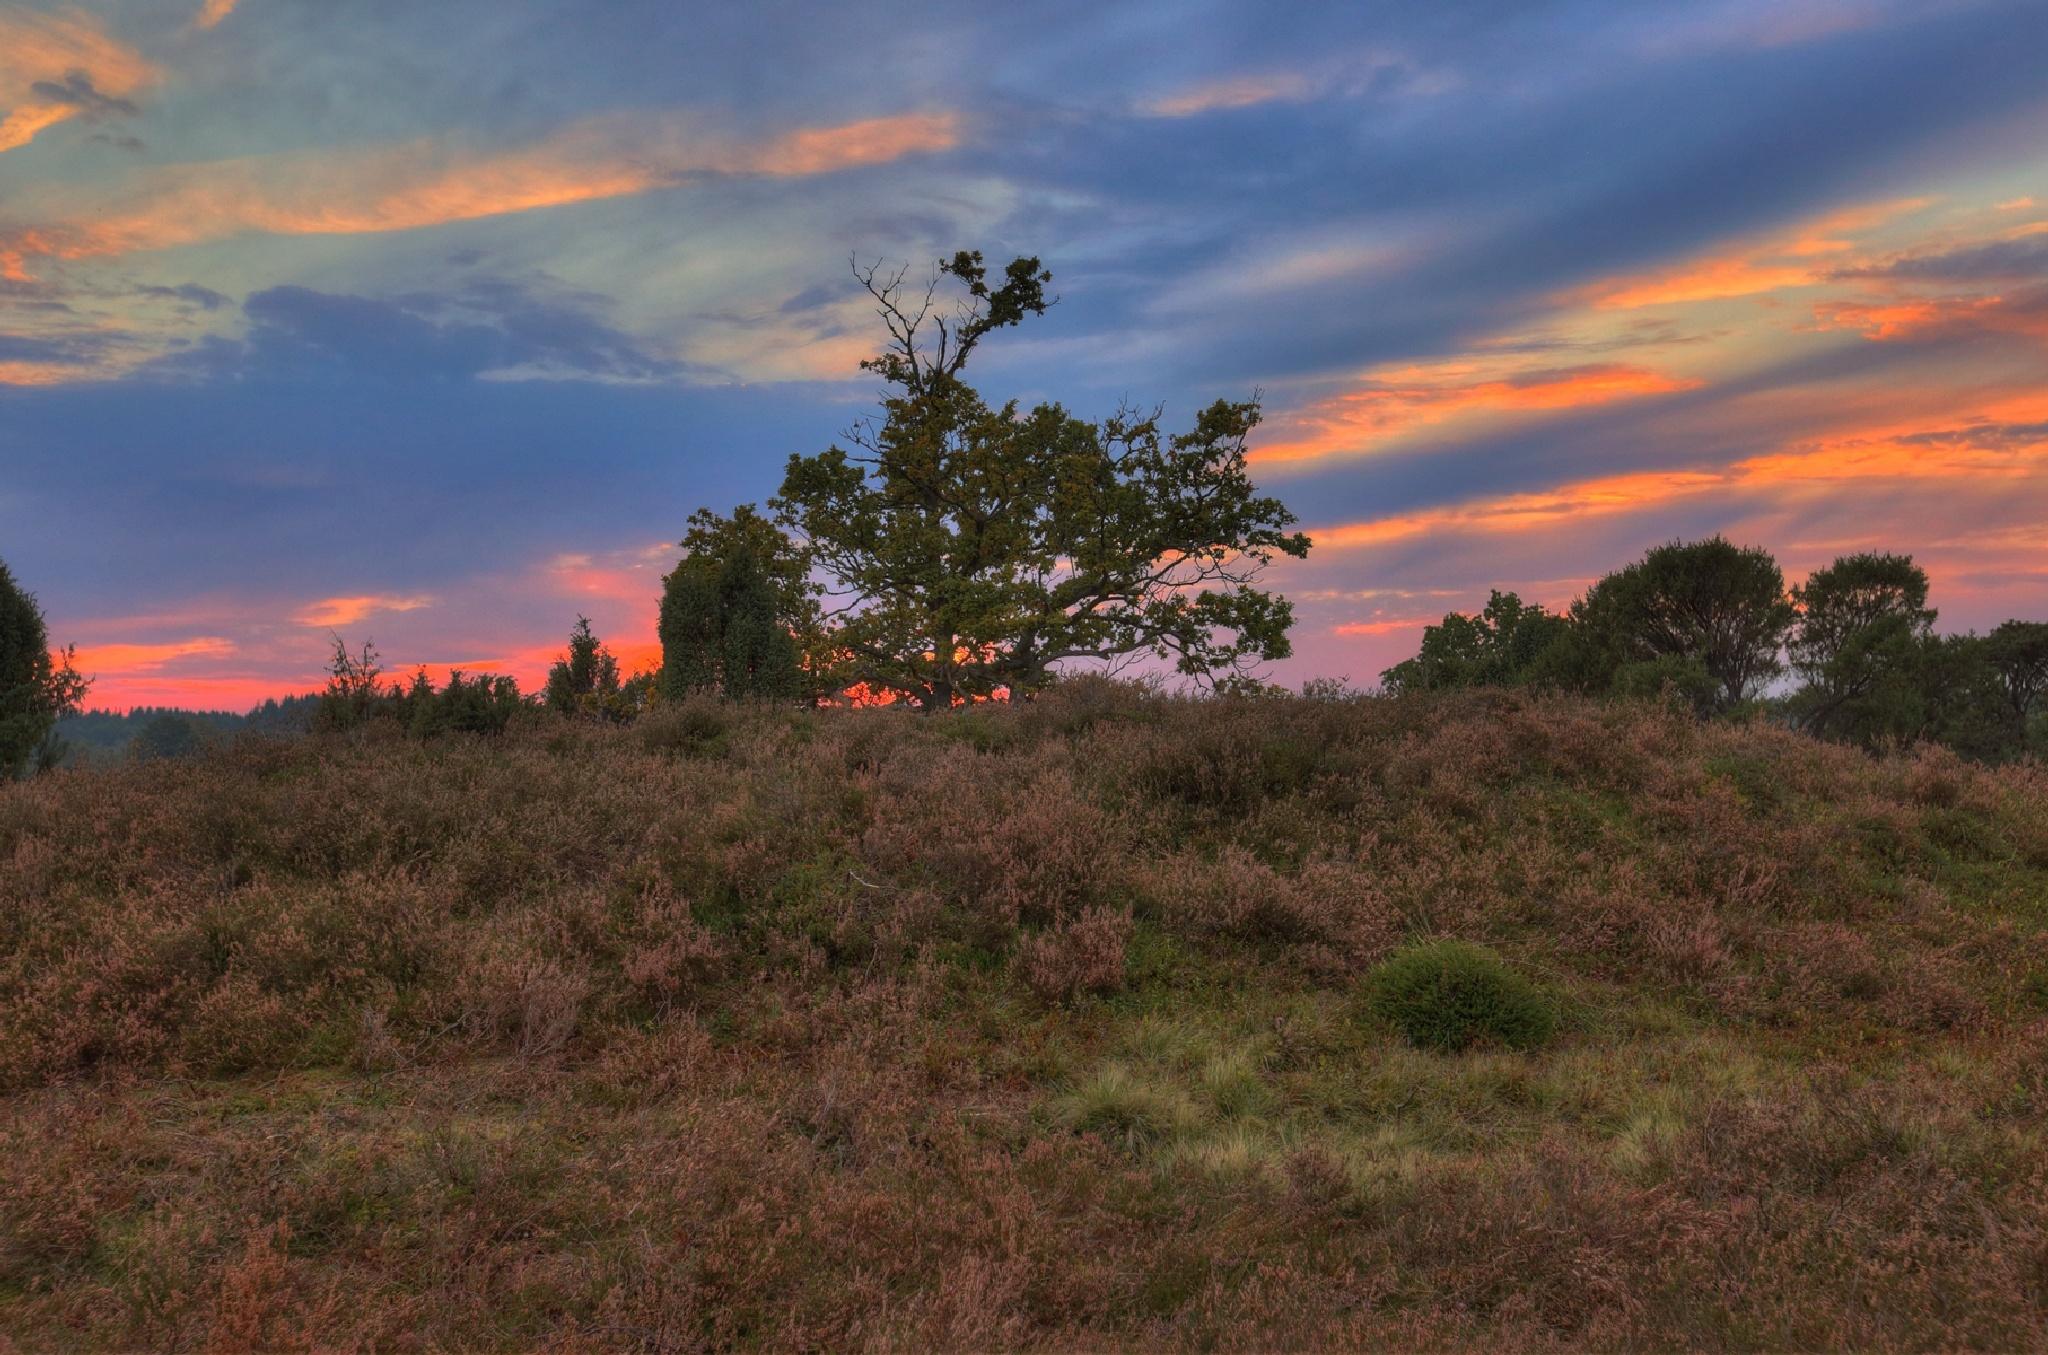 Abends in der Lüneburger Heide by Maik Richter Photography